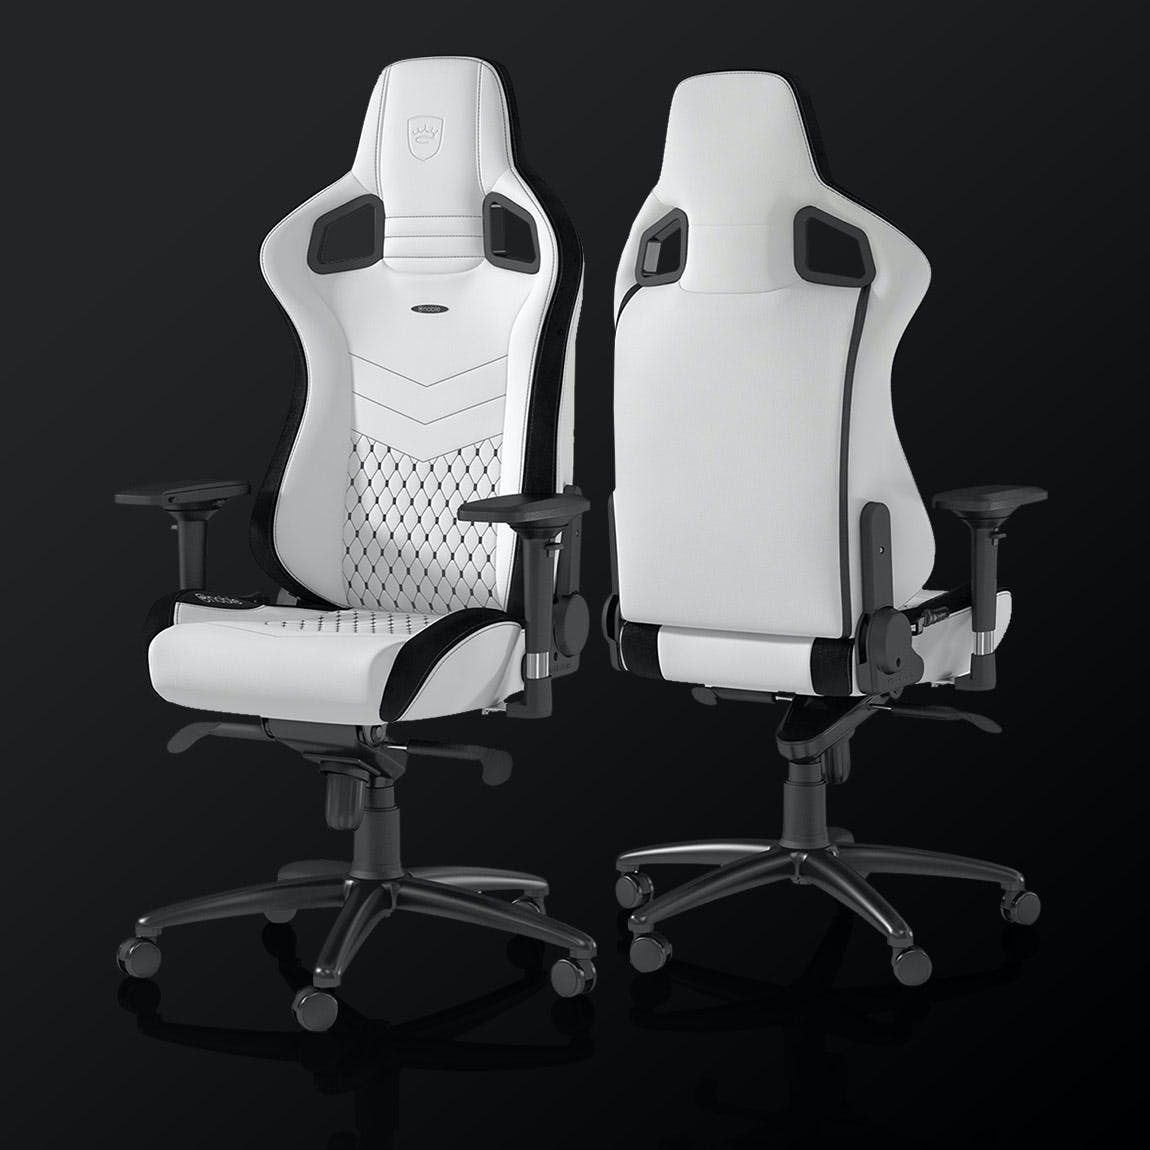 EPIC White / Black